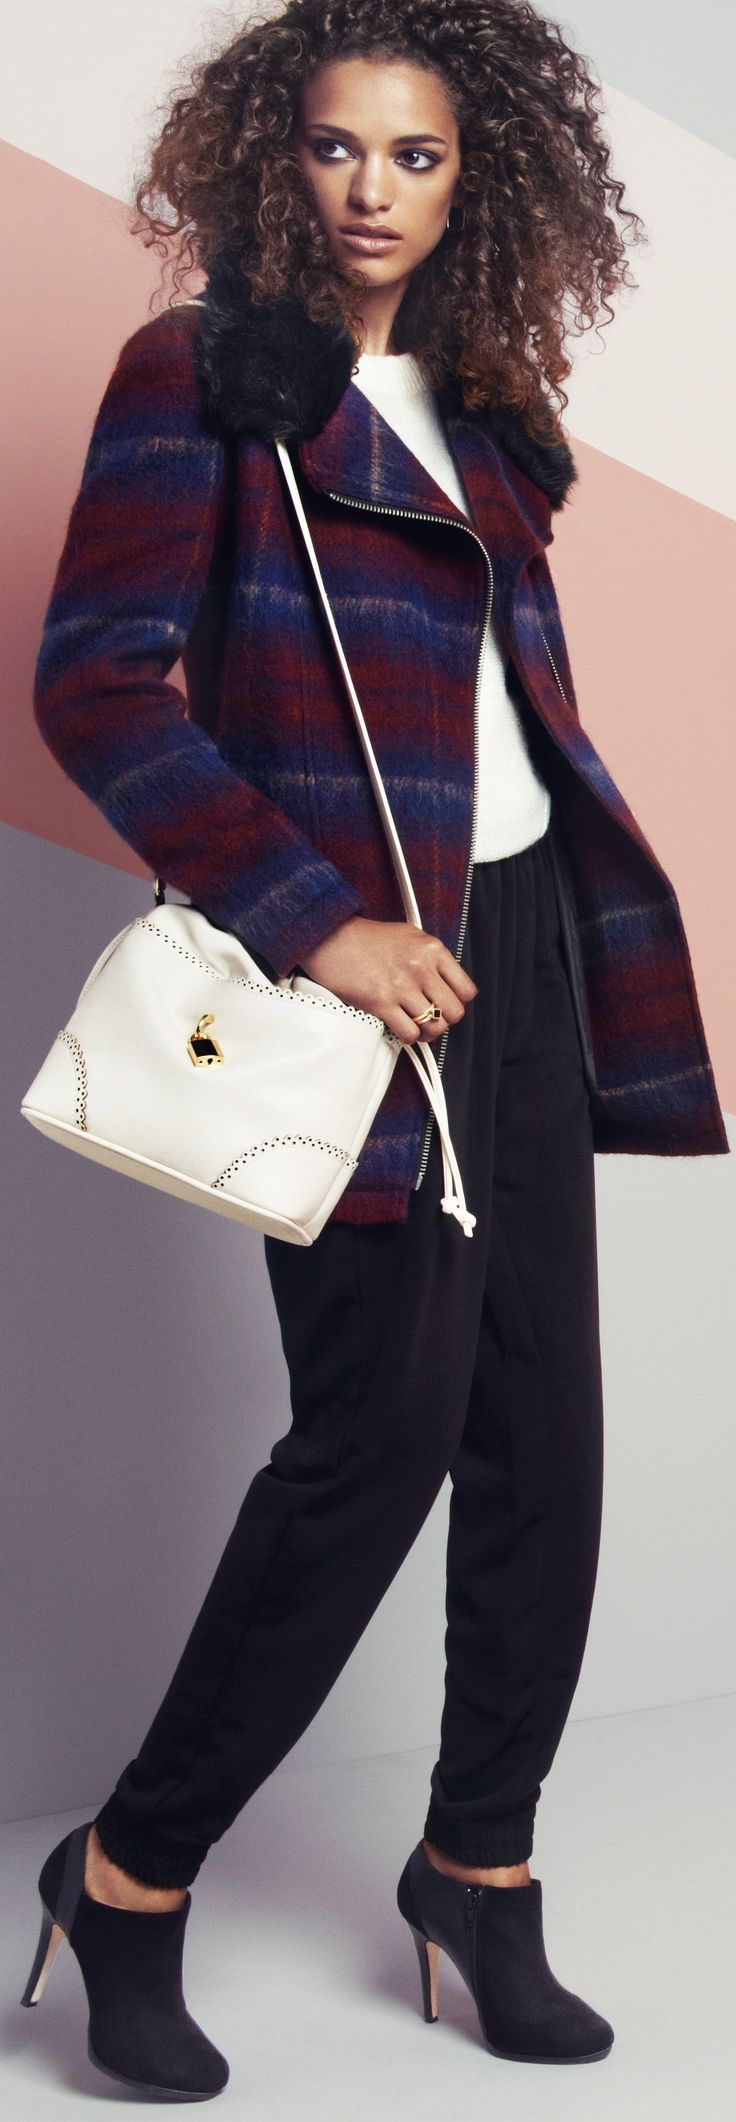 Cute handbag for spring / summer 2015 - house of fraser - read tips for travel bags - (article) - http://www.boomerinas.com/2013/02/02/best-crossbody-bags-for-travel-women-over-40-50-60/